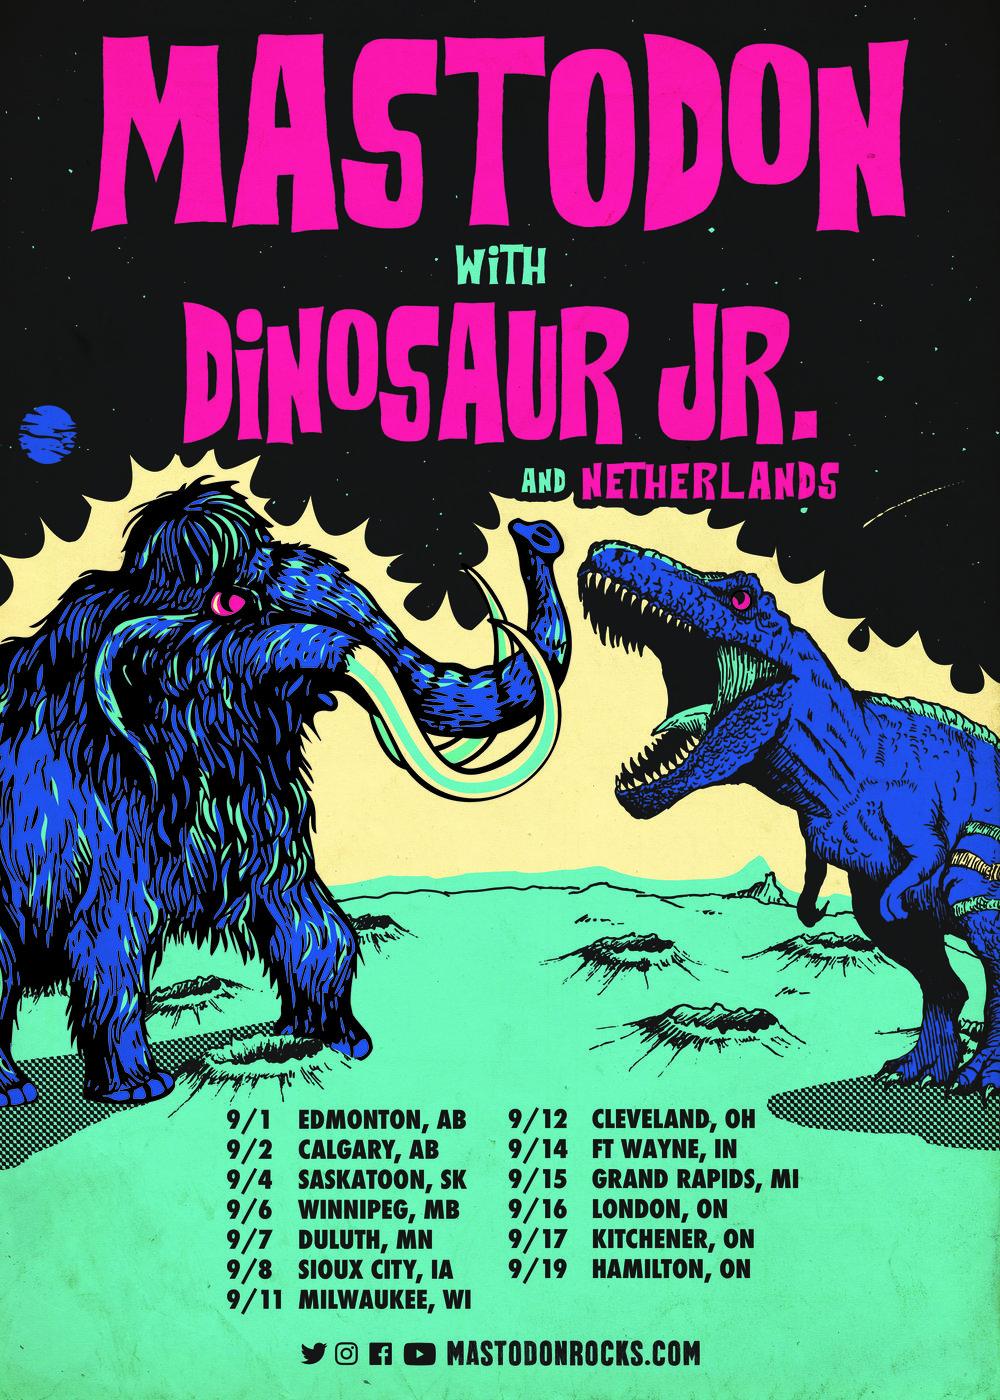 Mastodon Final with dates.jpg